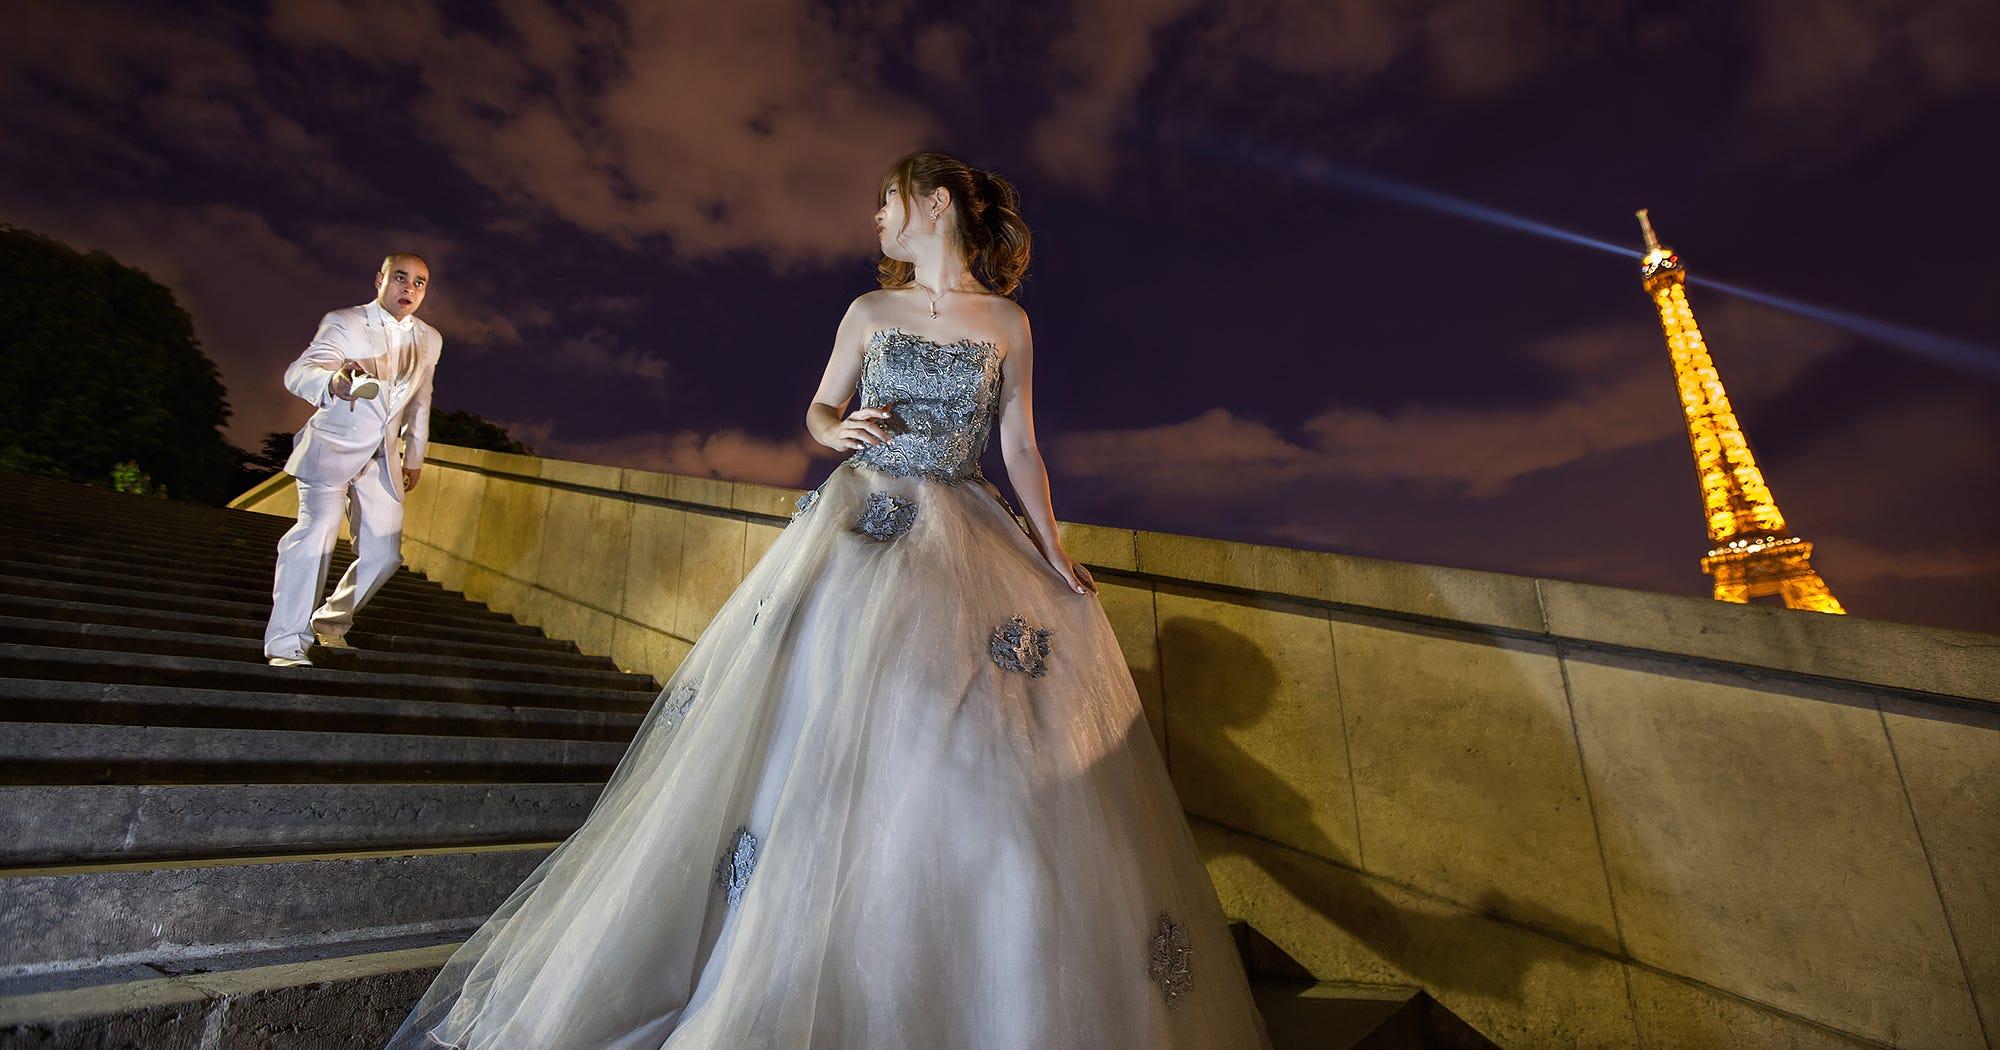 Disney Wedding Inspiration Photos